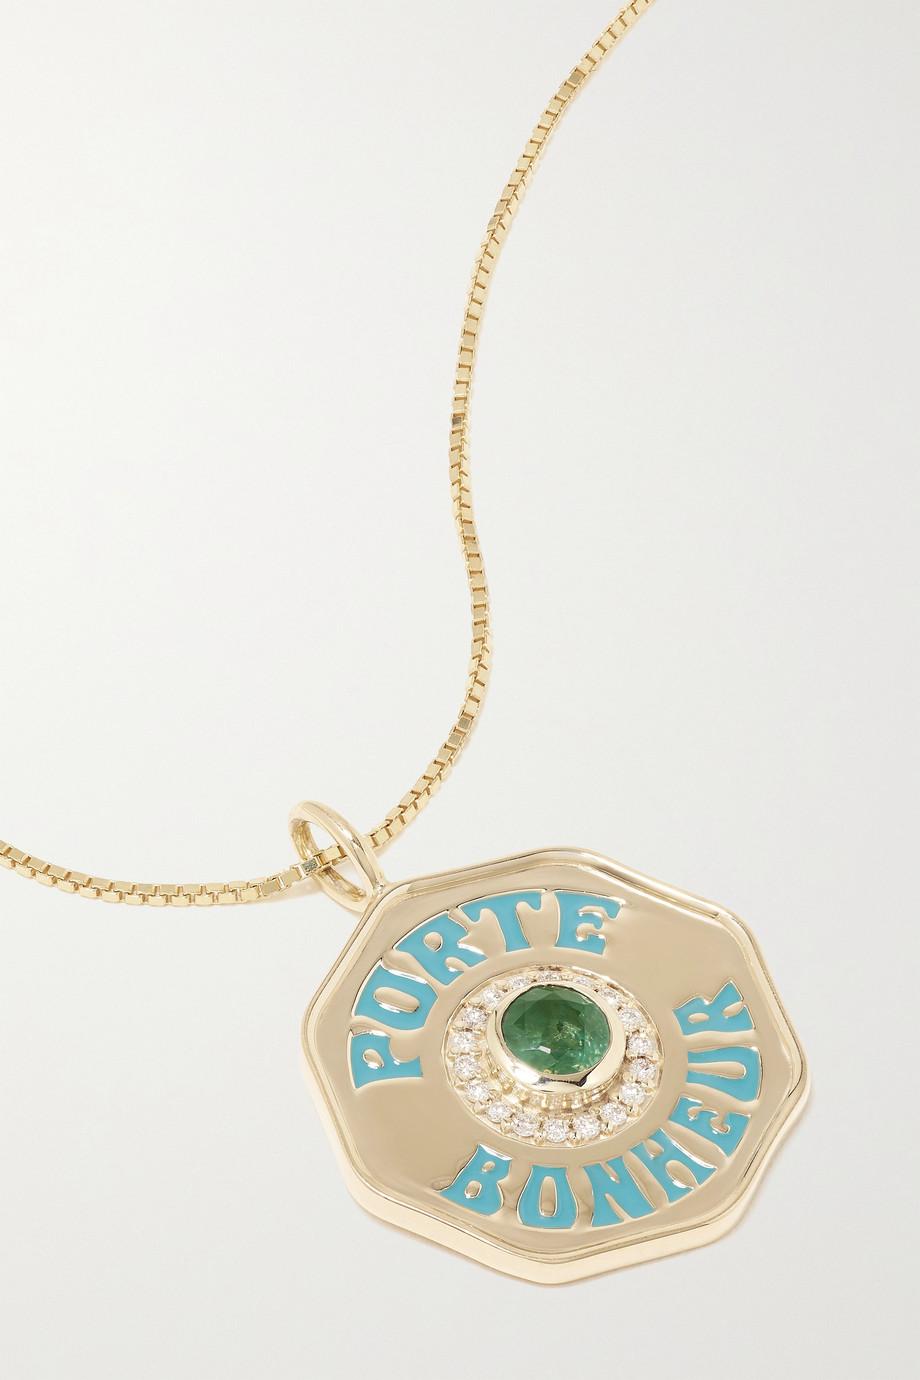 Marlo Laz Porte Bonheur Coin large 14-karat gold, enamel, alexandrite and diamond necklace